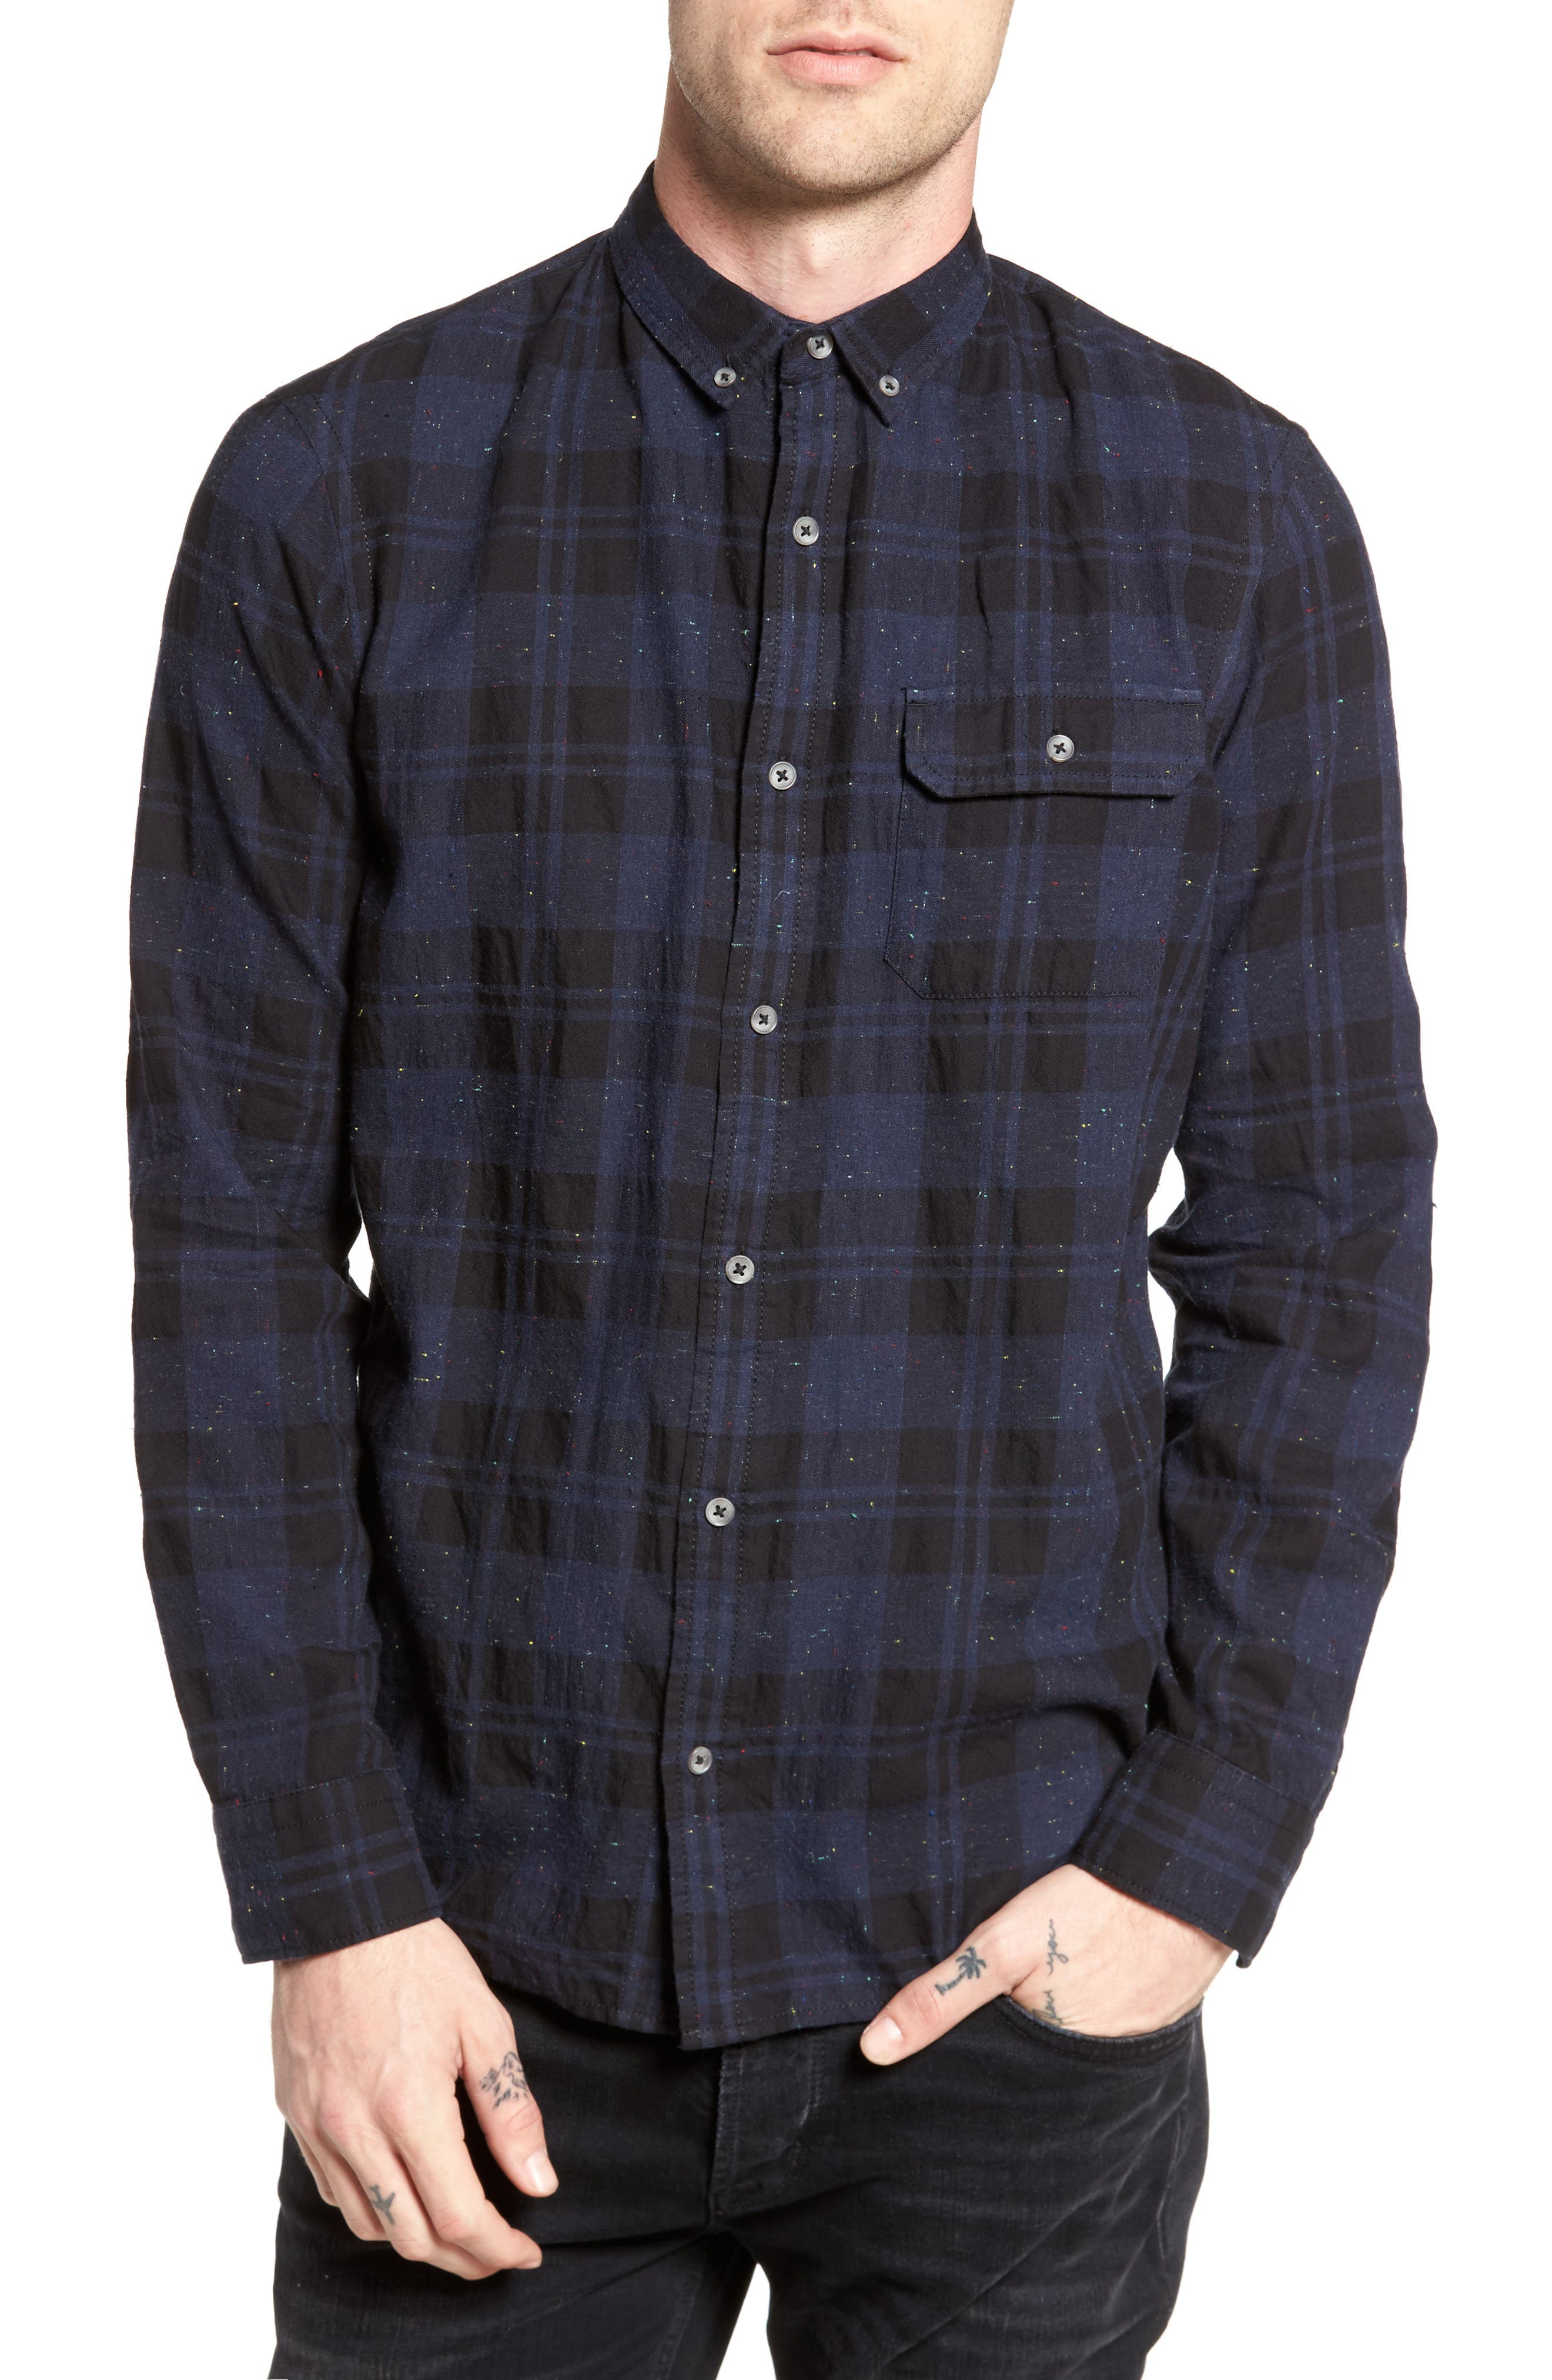 The Rail Long Sleeve Plaid Nep Shirt